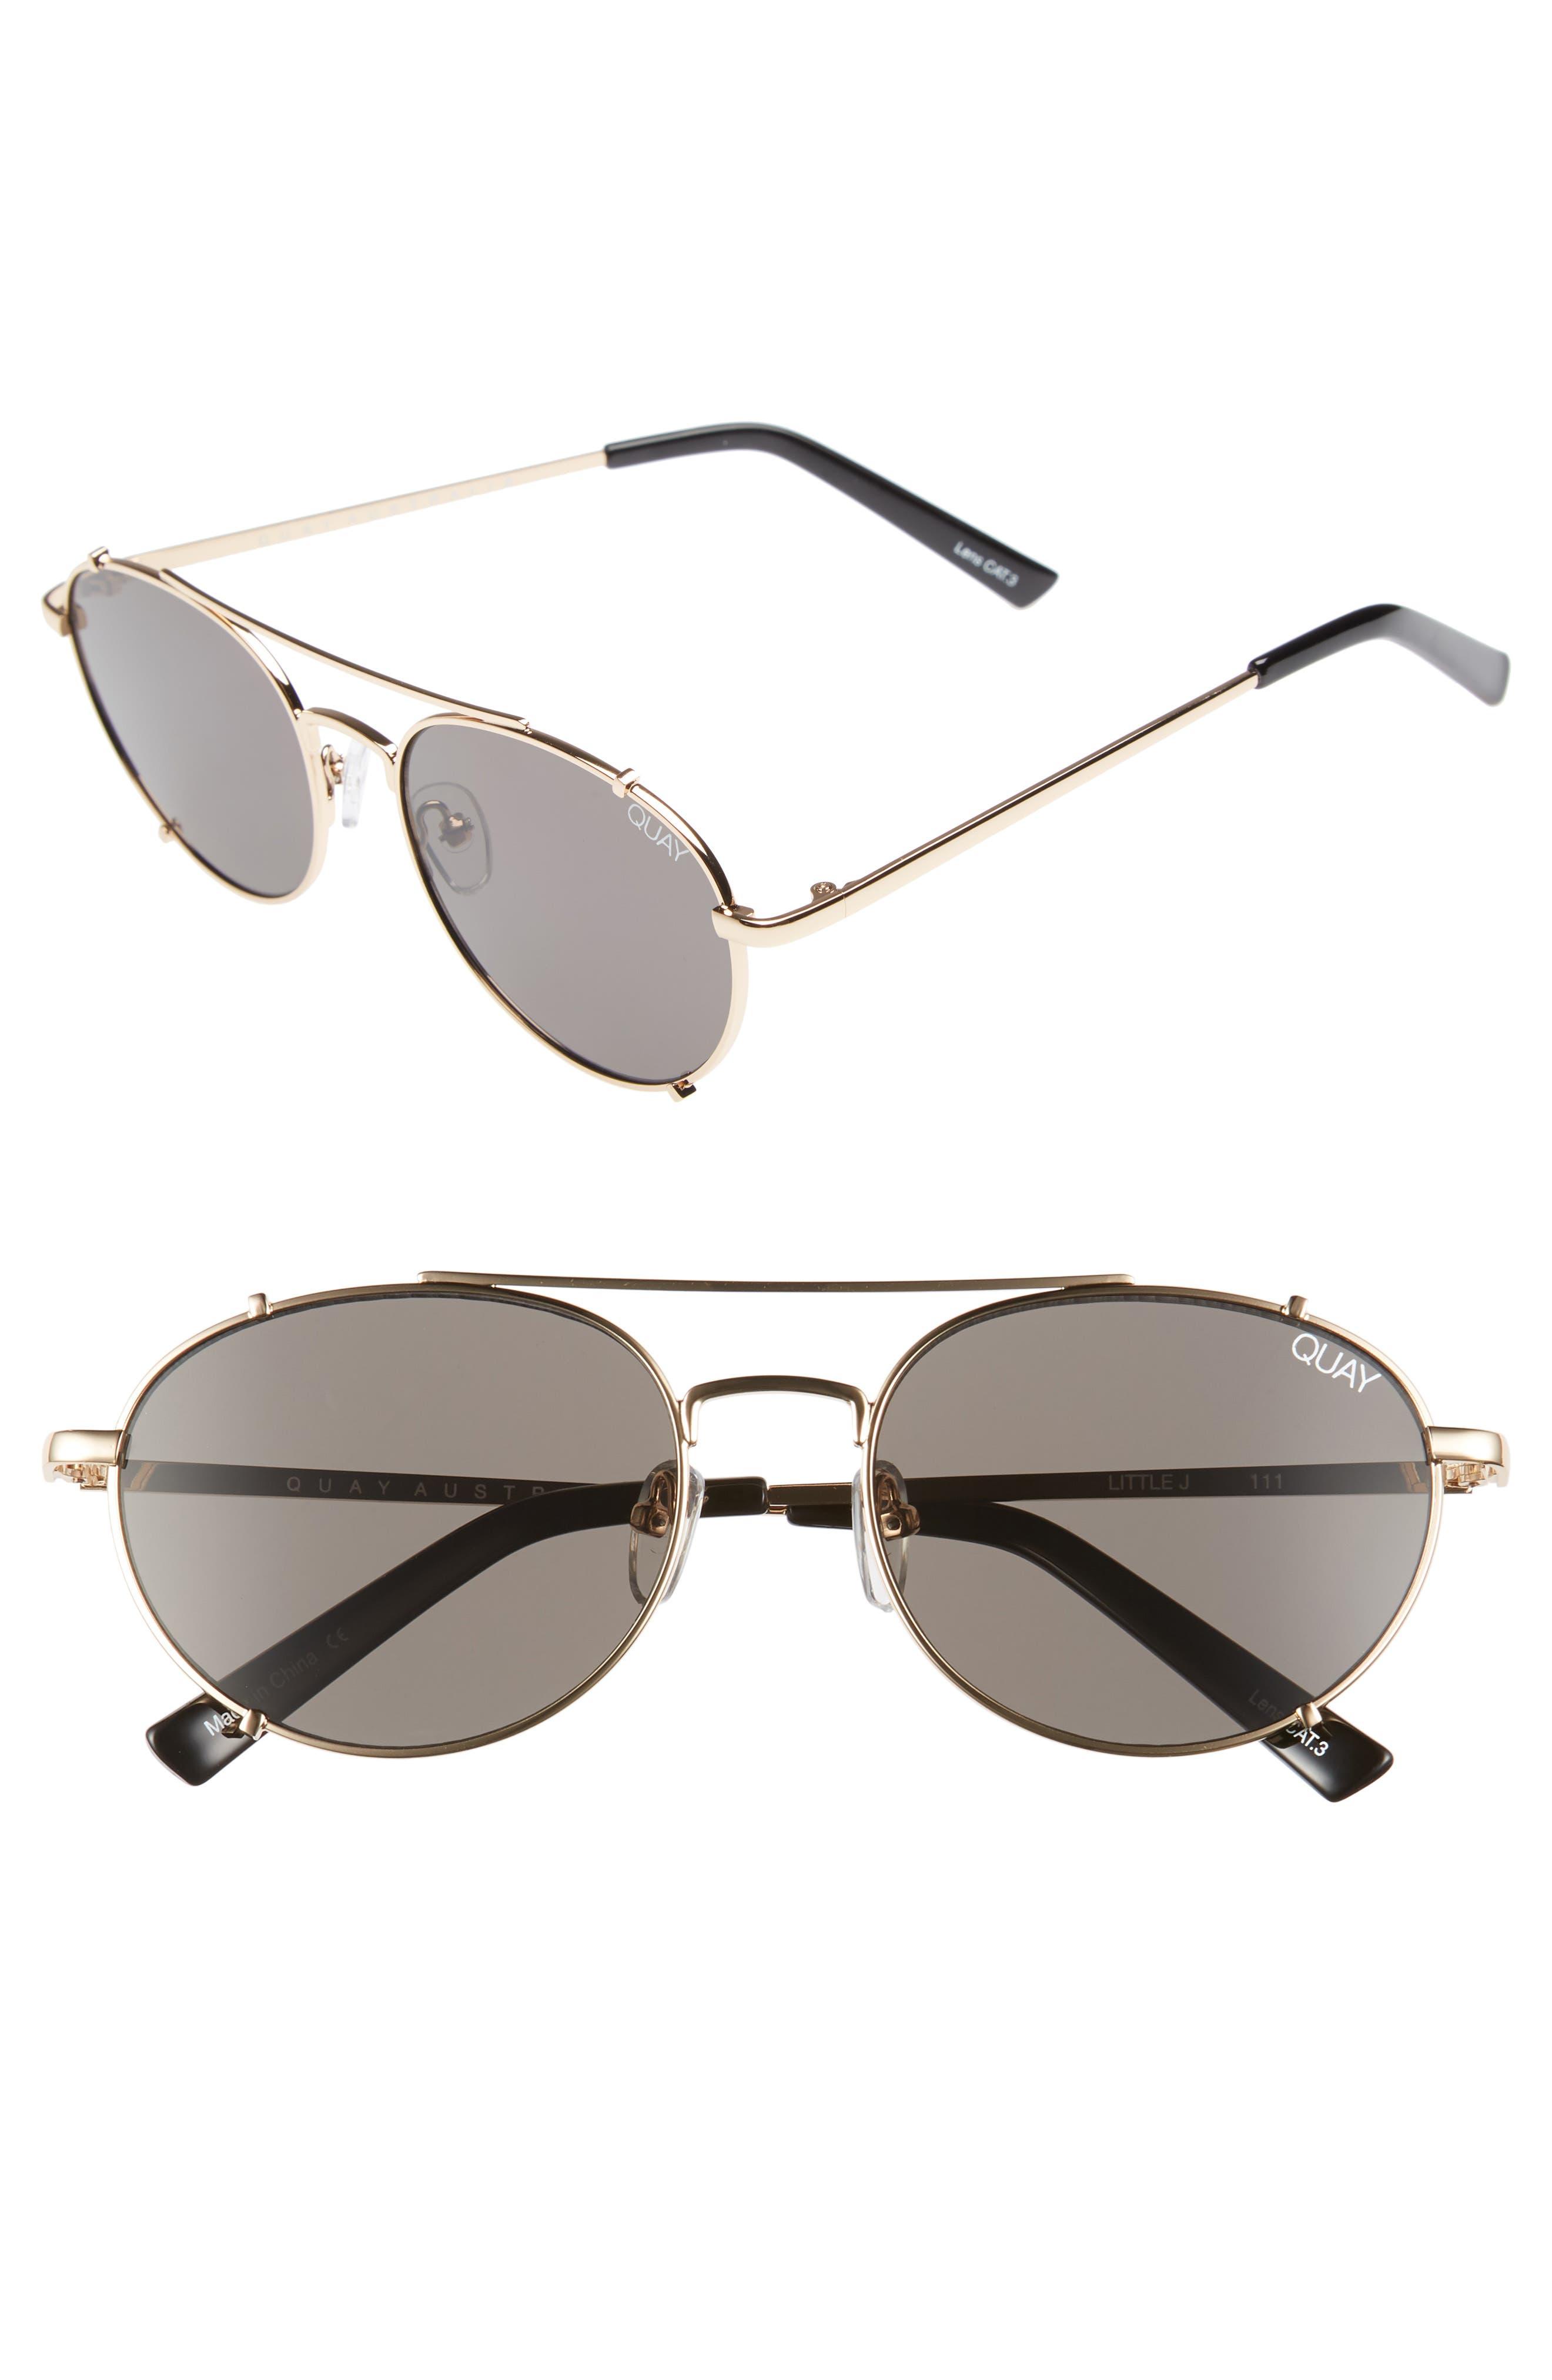 Little J 55mm Aviator Sunglasses,                             Main thumbnail 1, color,                             GOLD/ SMOKE